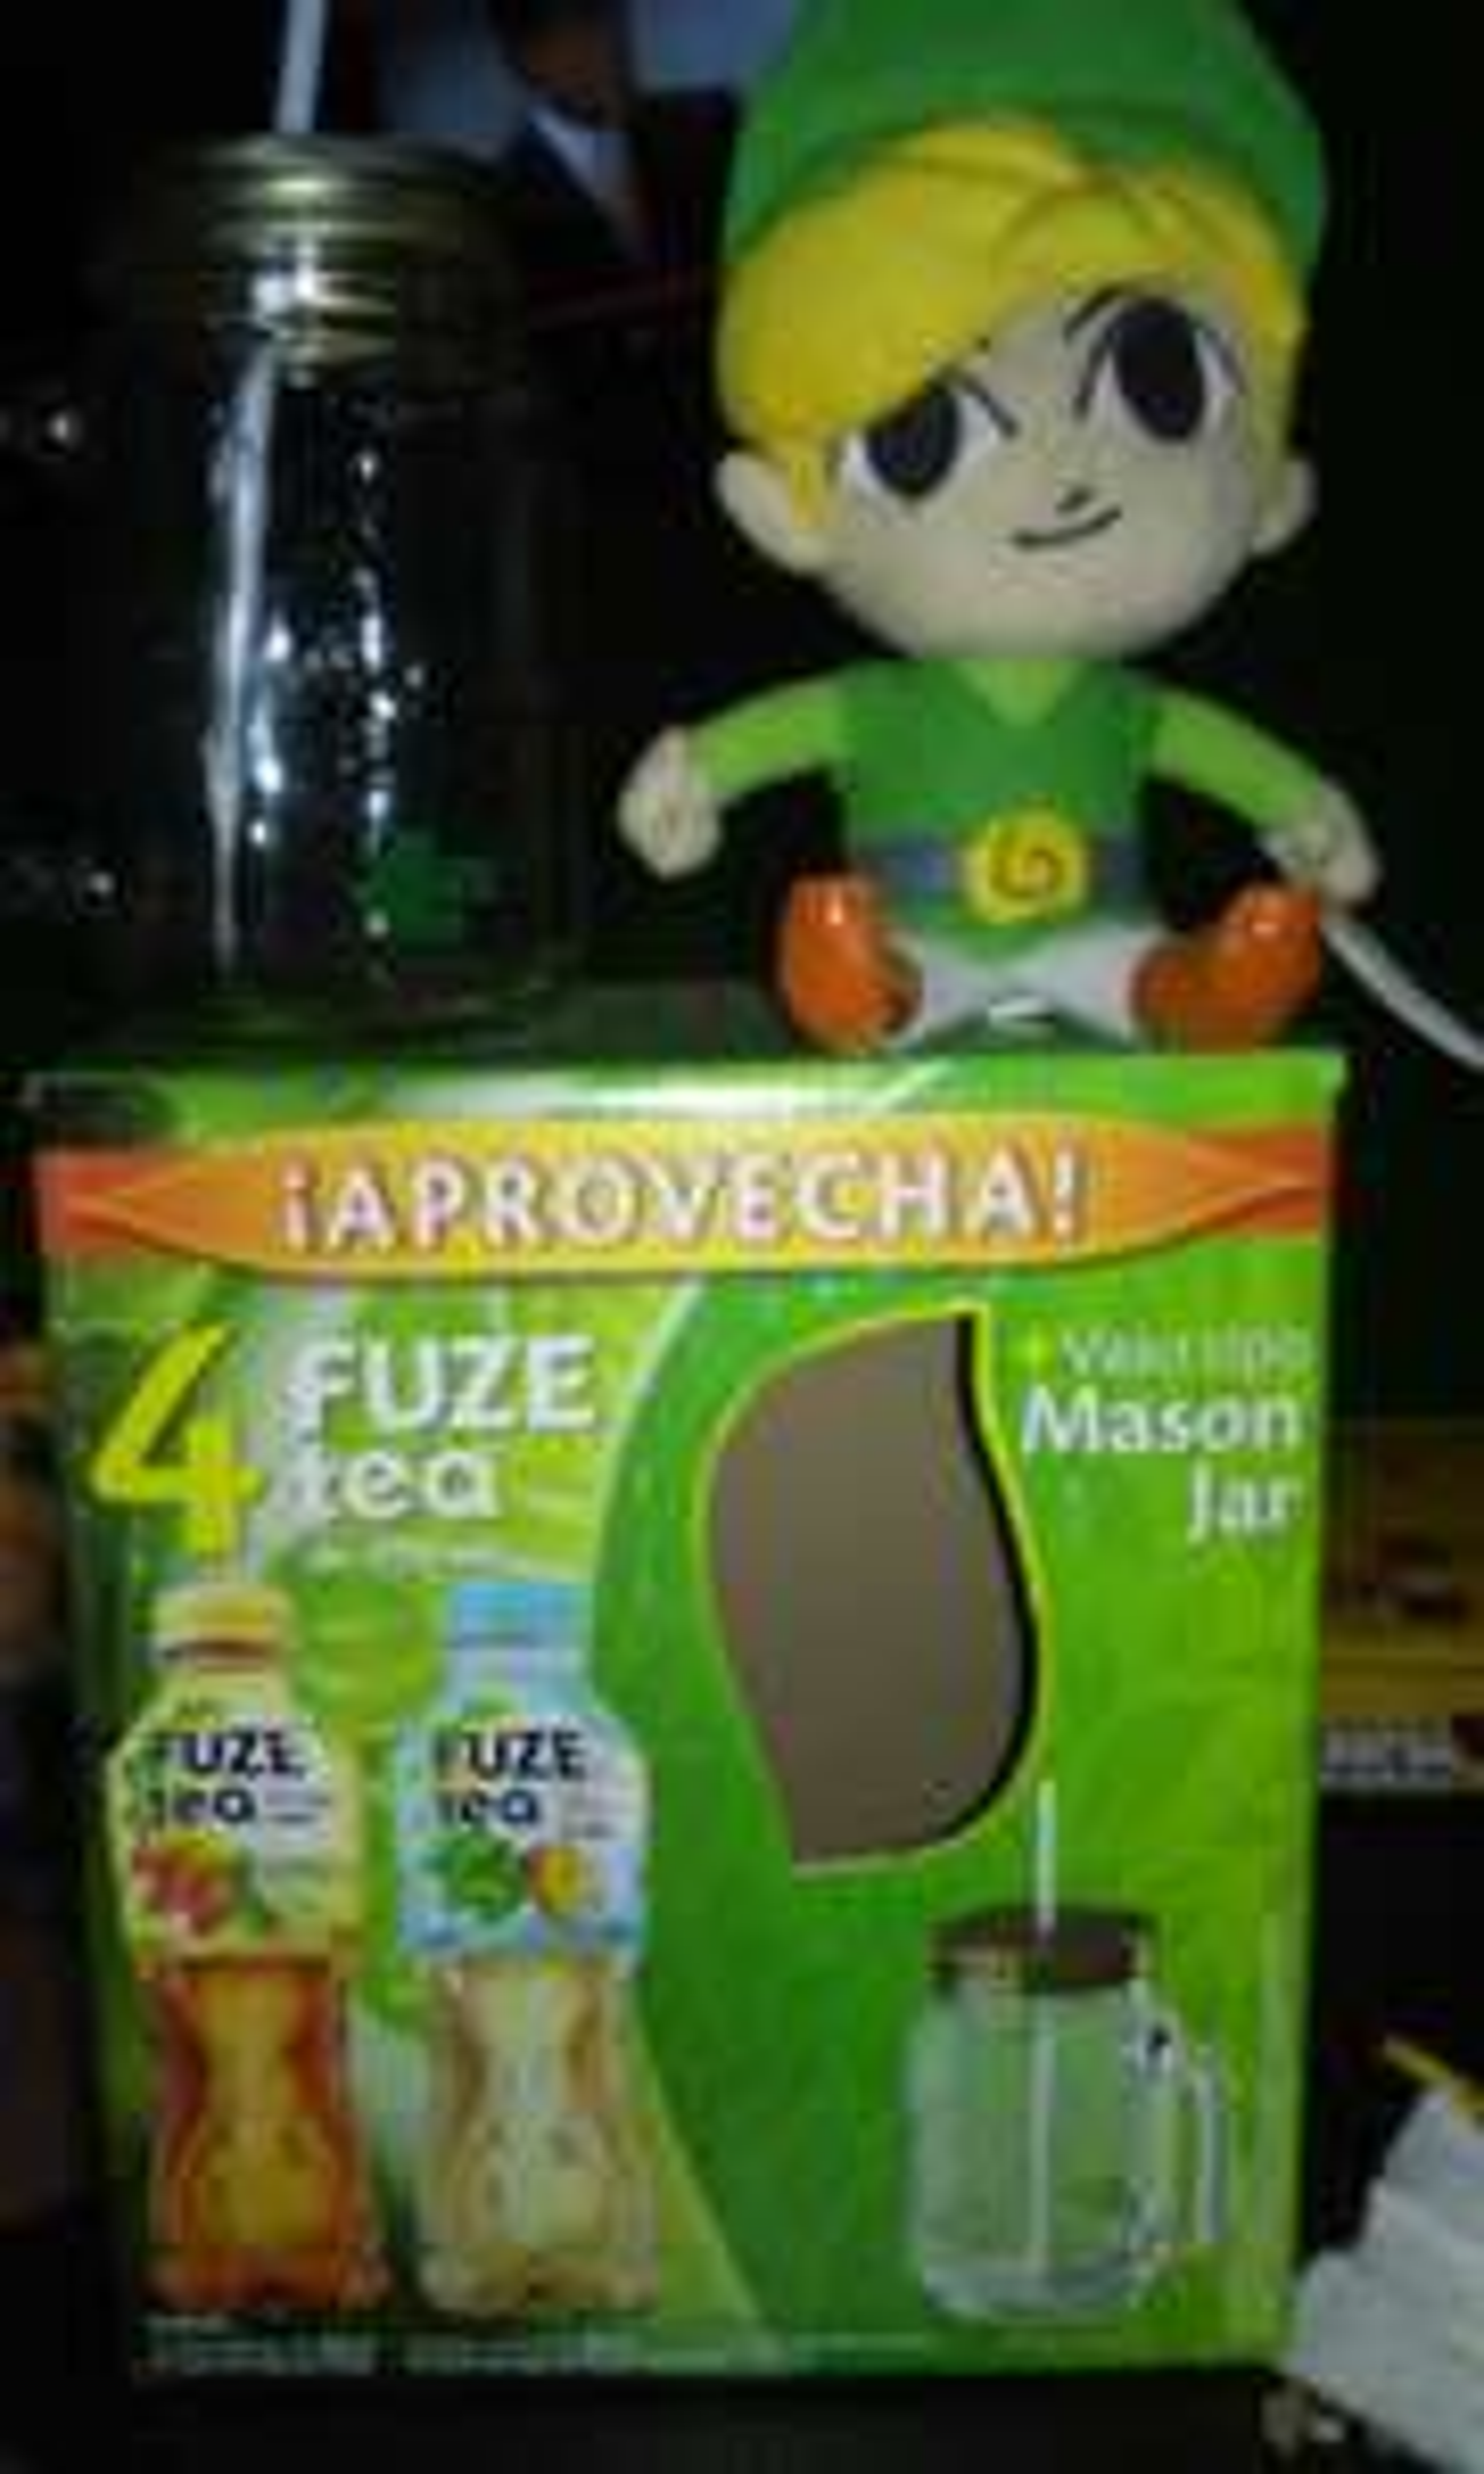 Walmart: 4 Fuze tea + Mason Jar $42.90